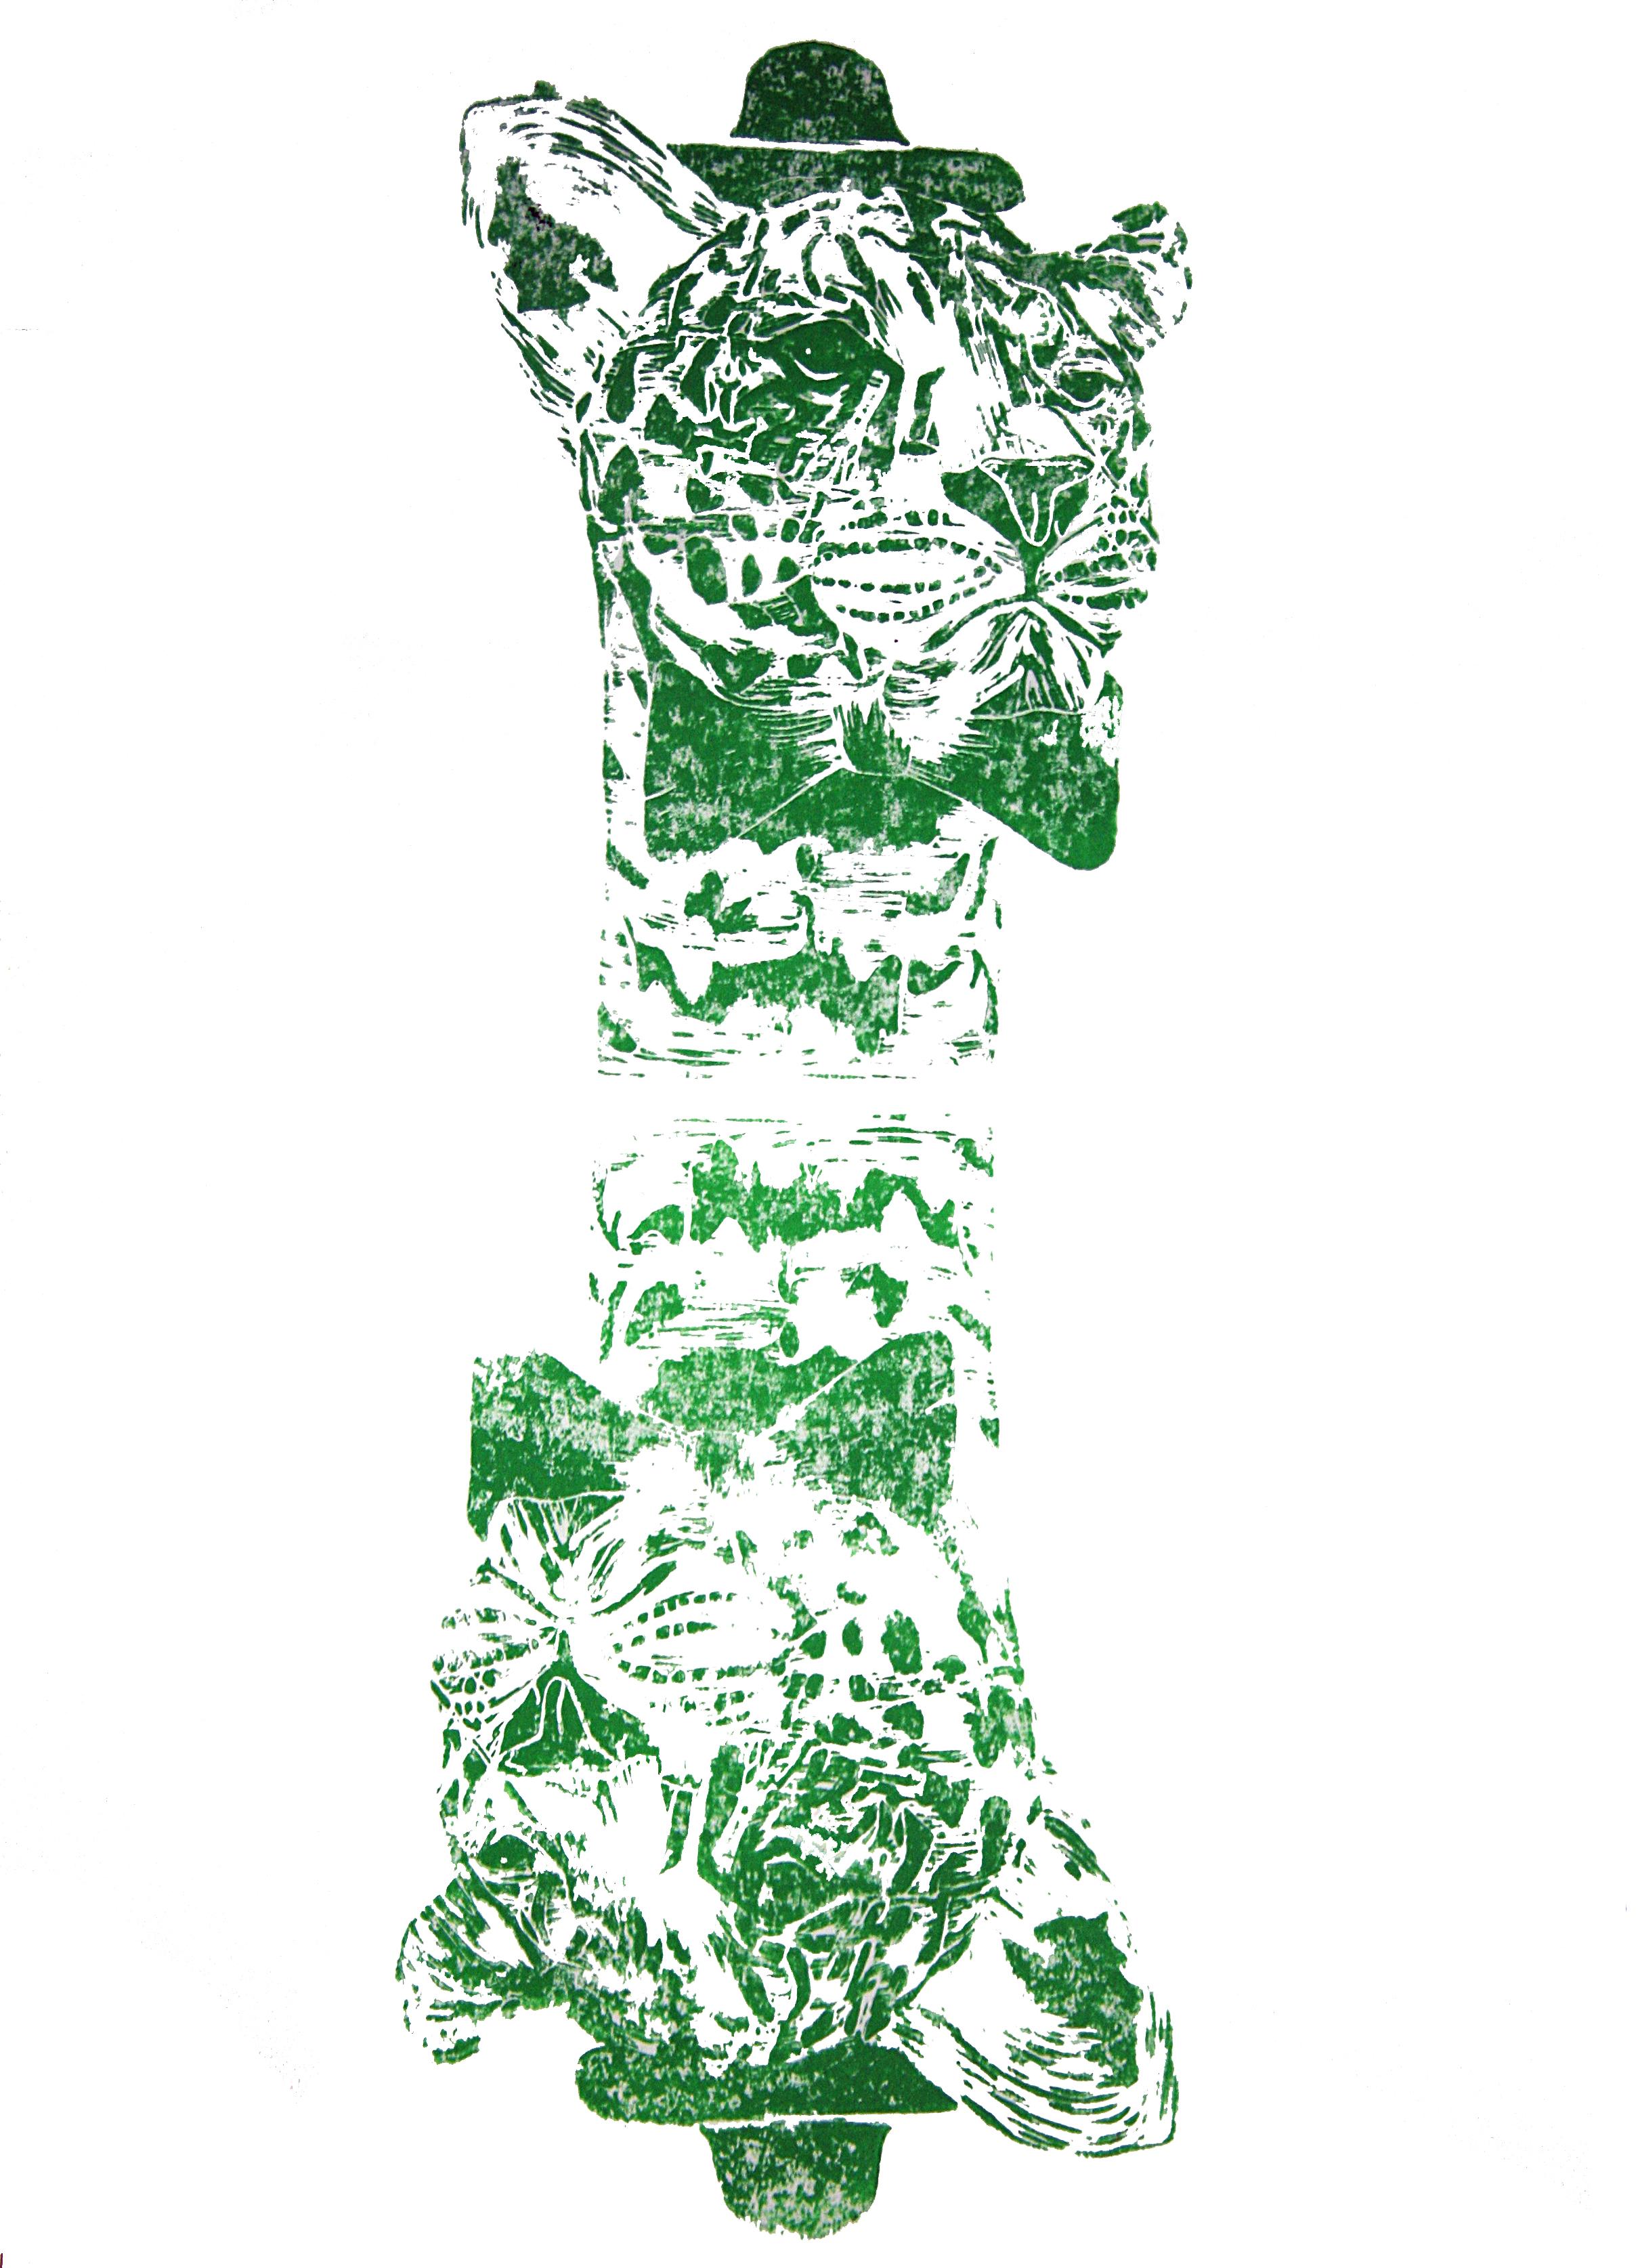 'Mr. Leopard- two heads' (green), on paper, 42cm x 59.4cm,